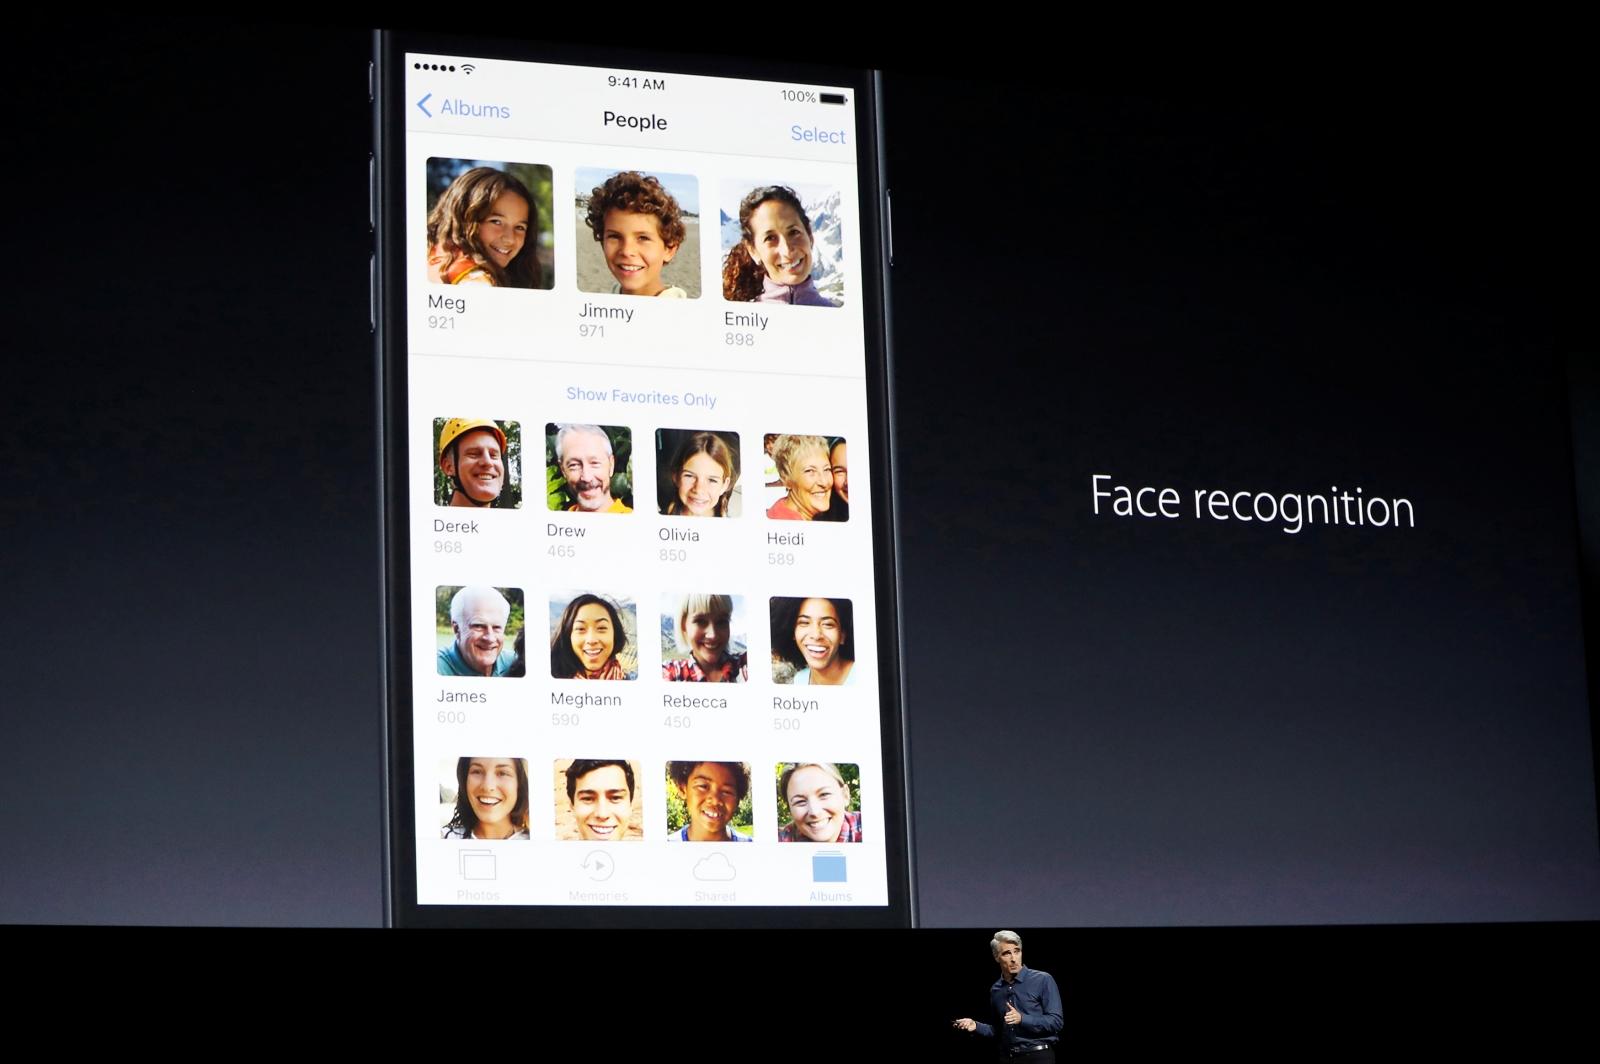 Error 14 with iOS 10 installation